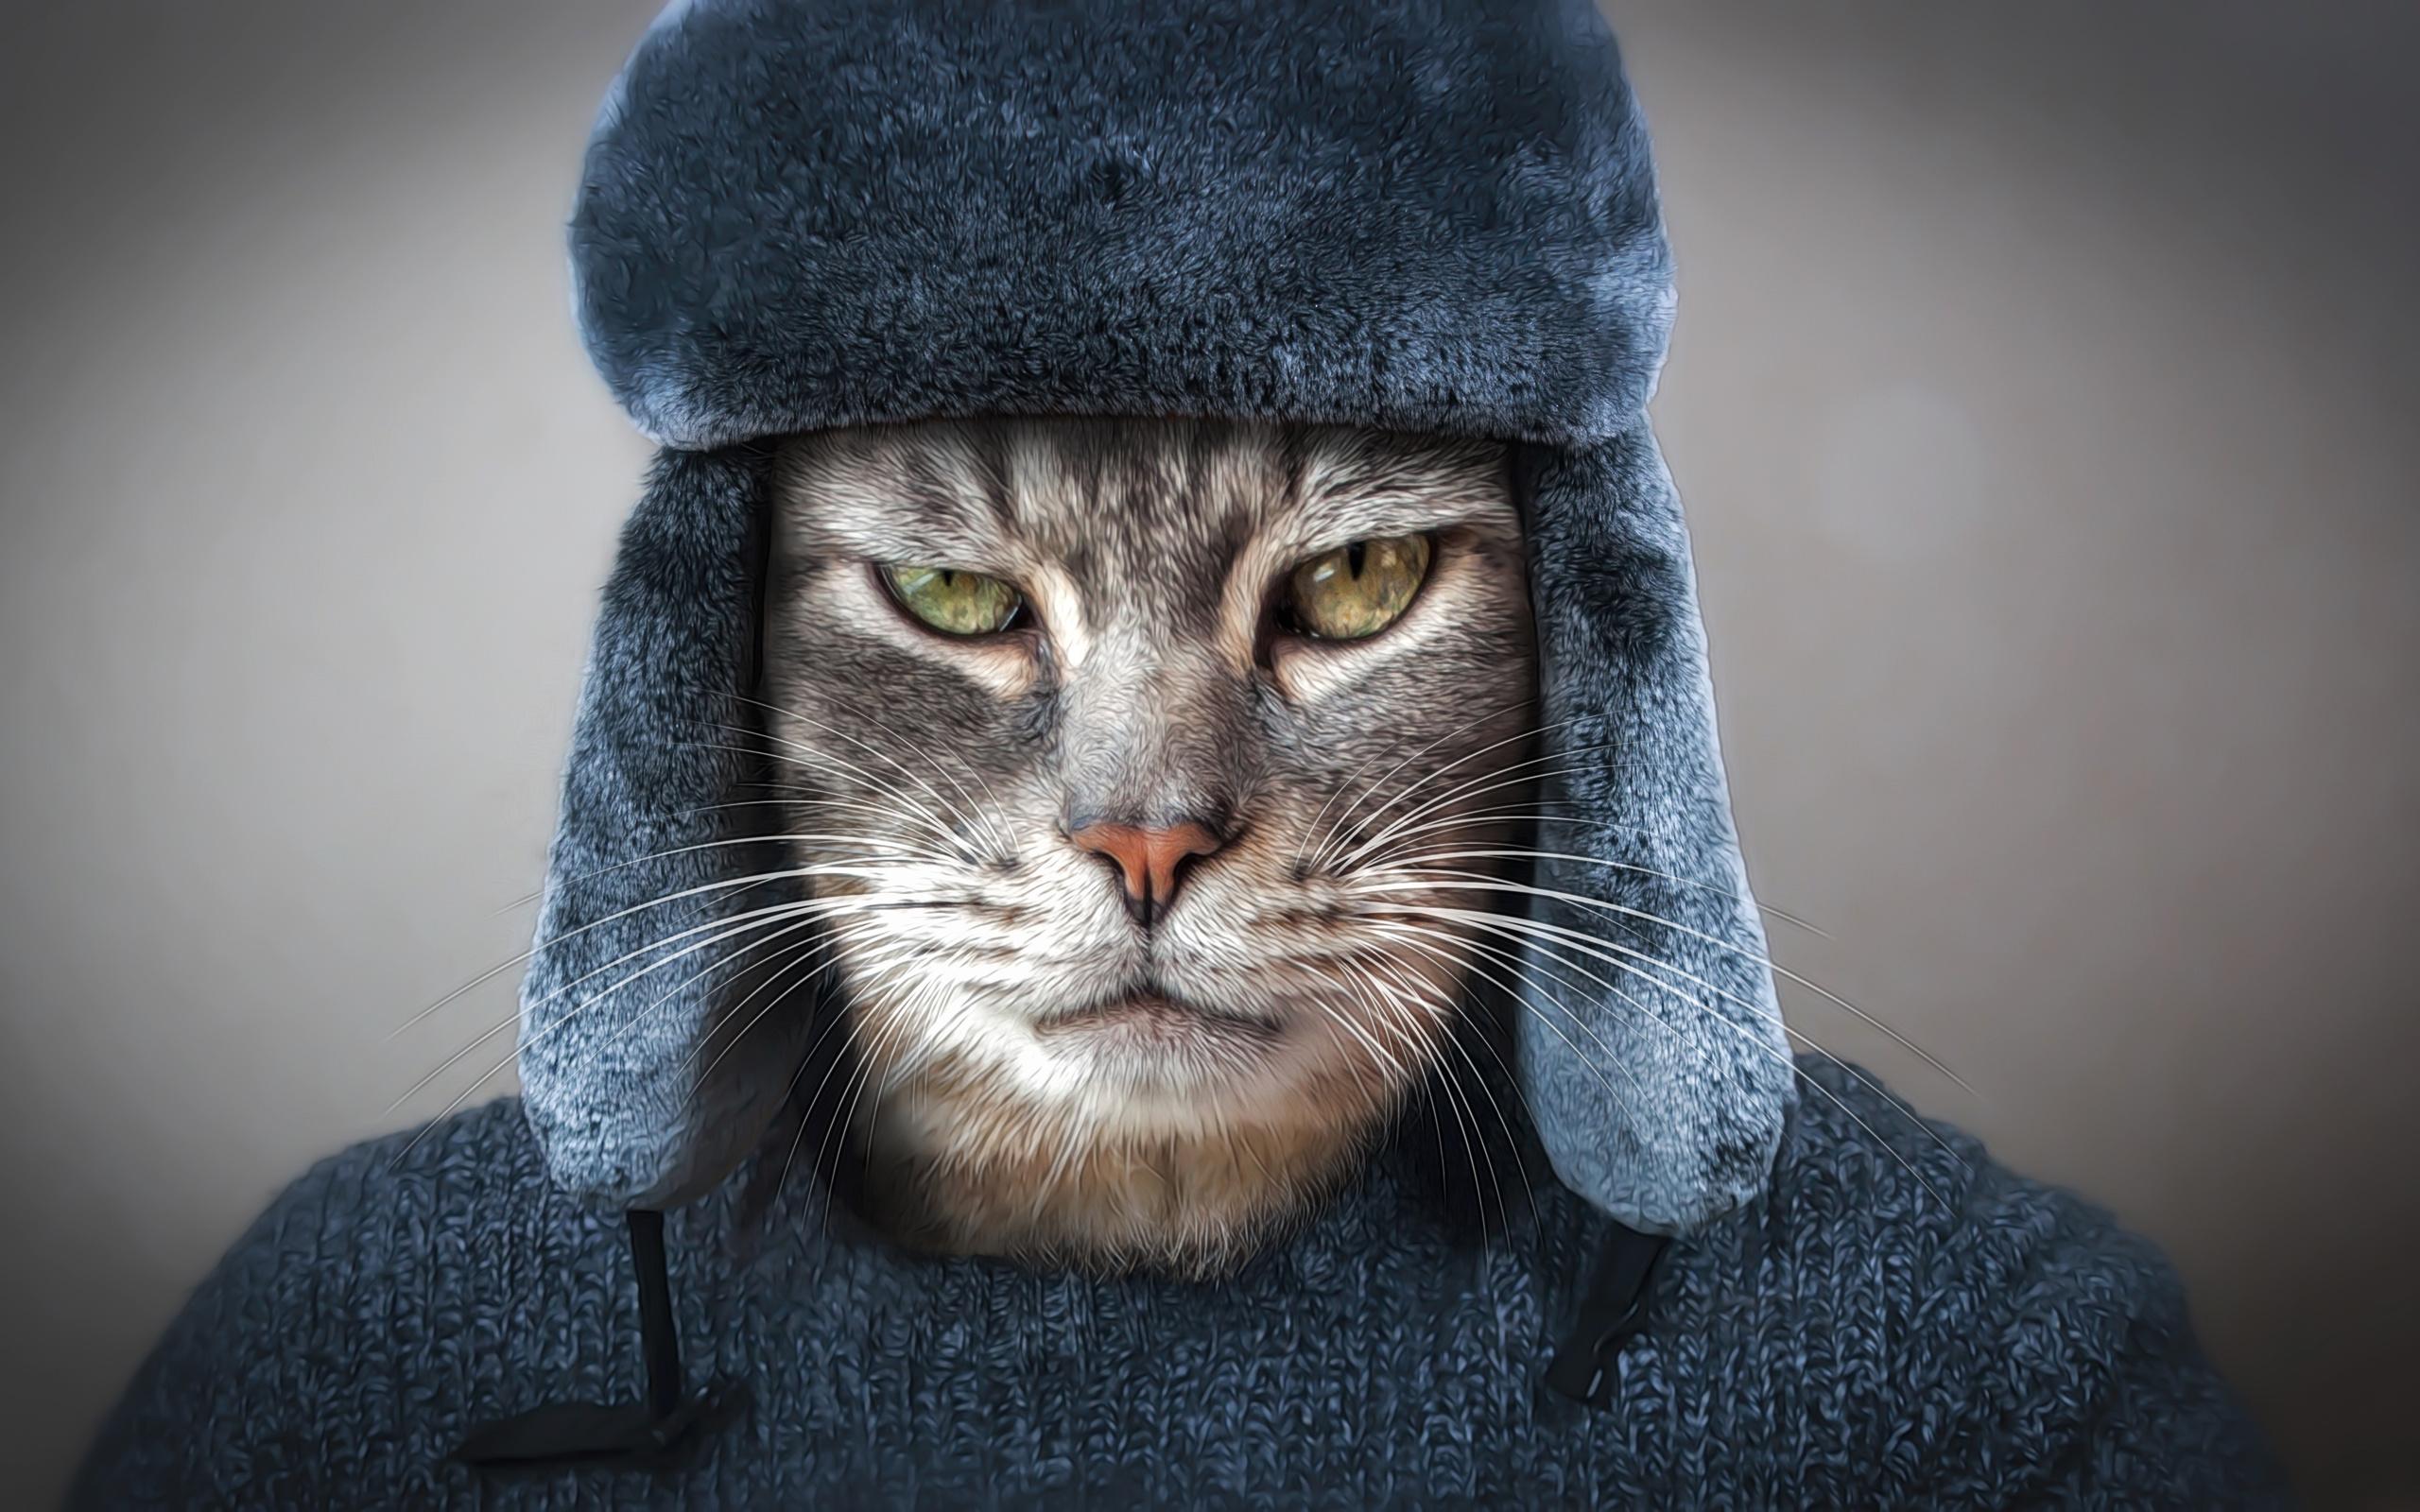 глаза, кот, взгляд, морда, рендеринг, серый, фон, одежда, шапка